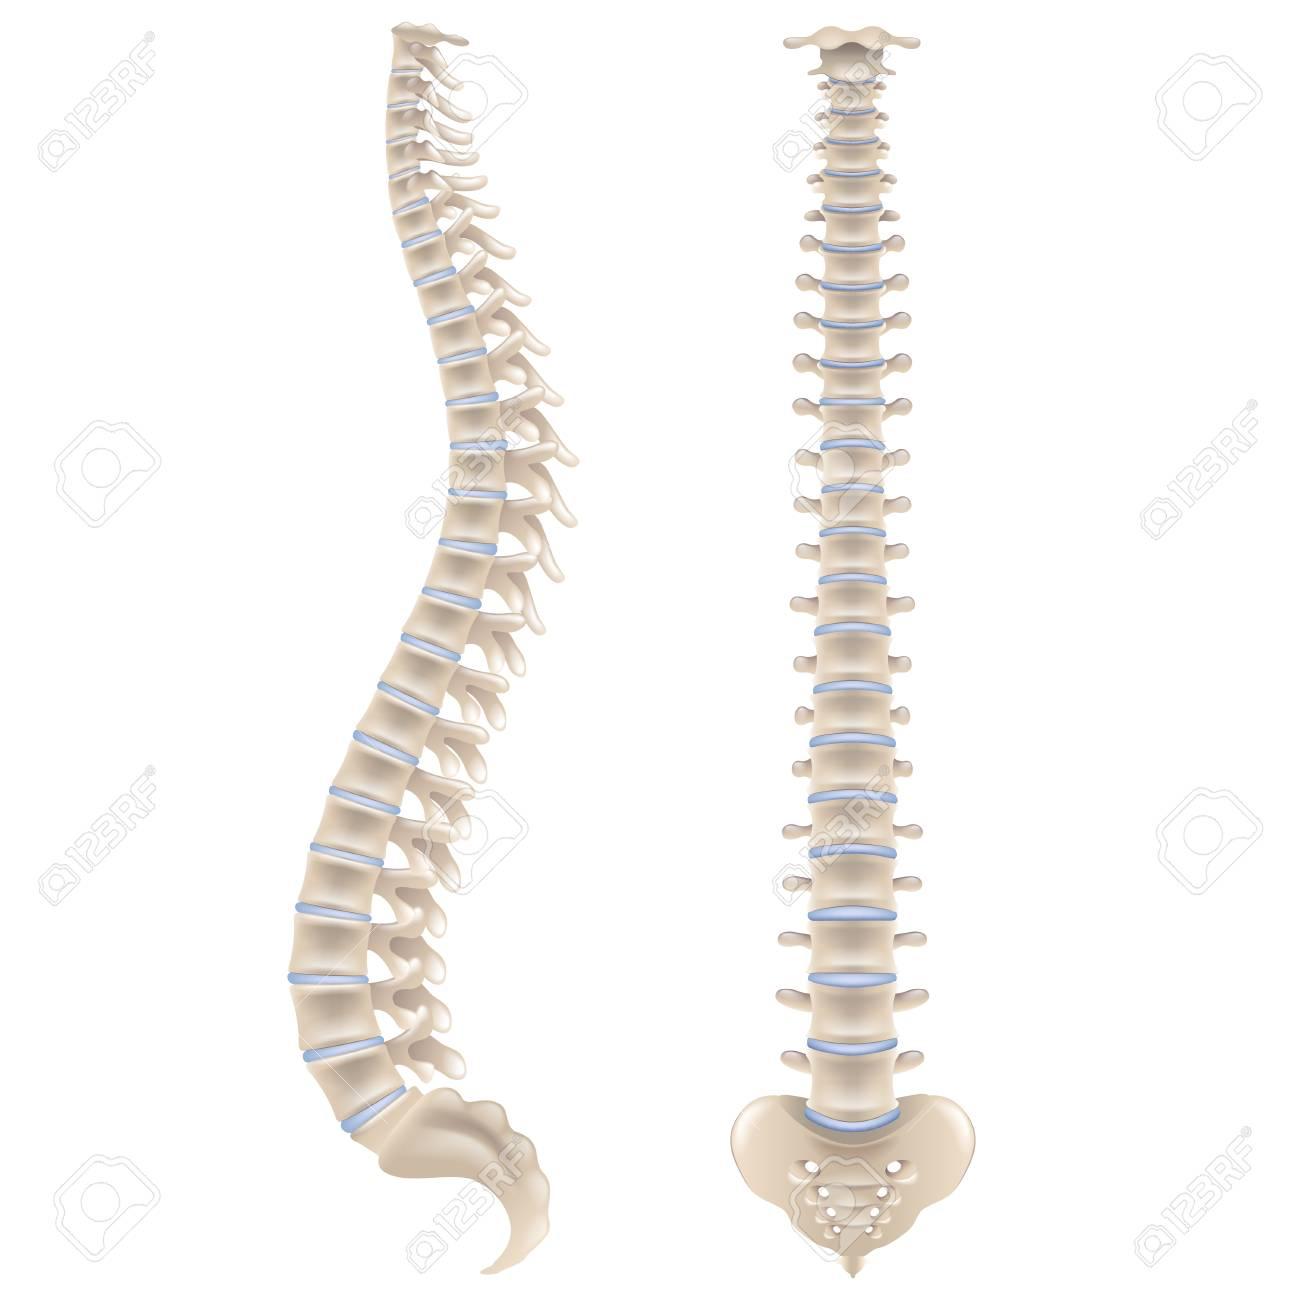 Spine bones isolated on white photo-realistic vector illustration - 103320756